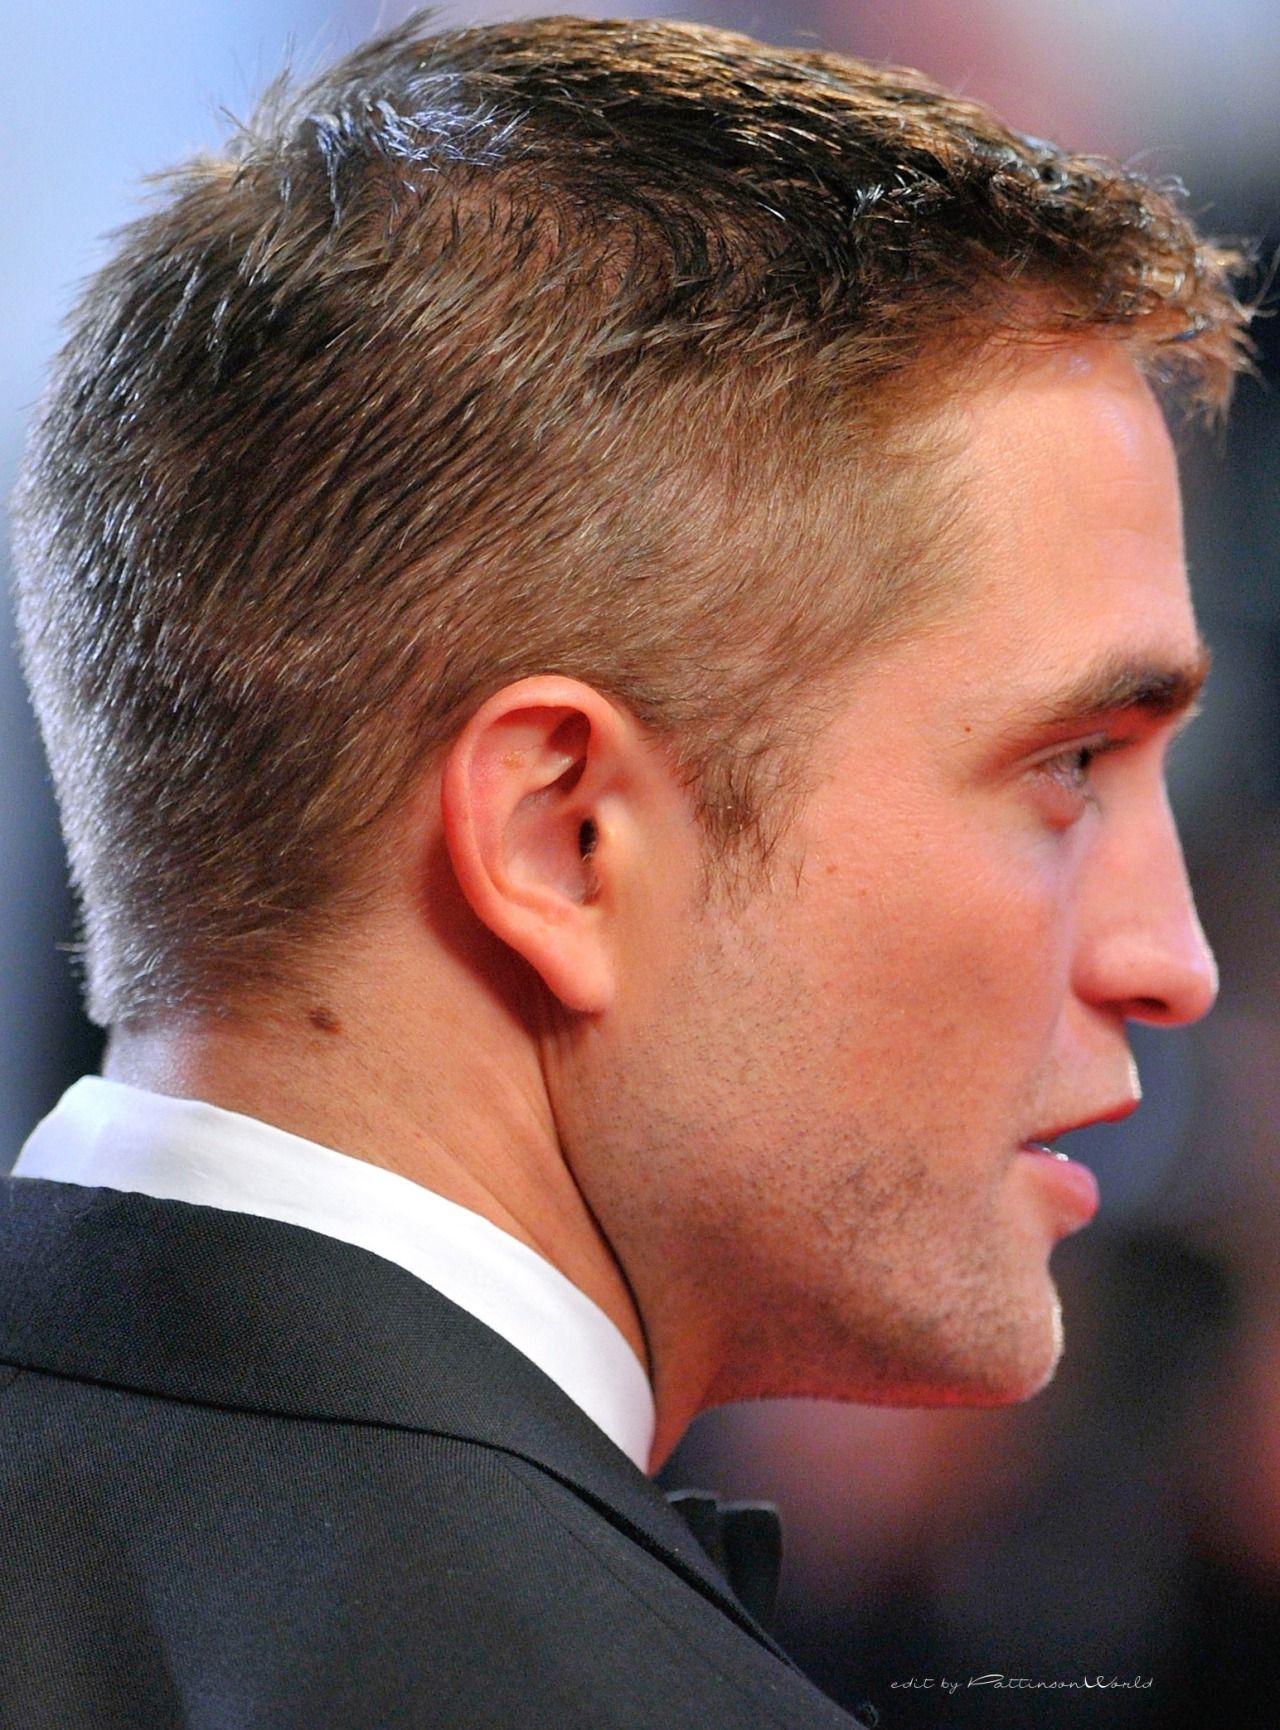 PattinsonWorld edit Premiere The Rover (Cannes 2014